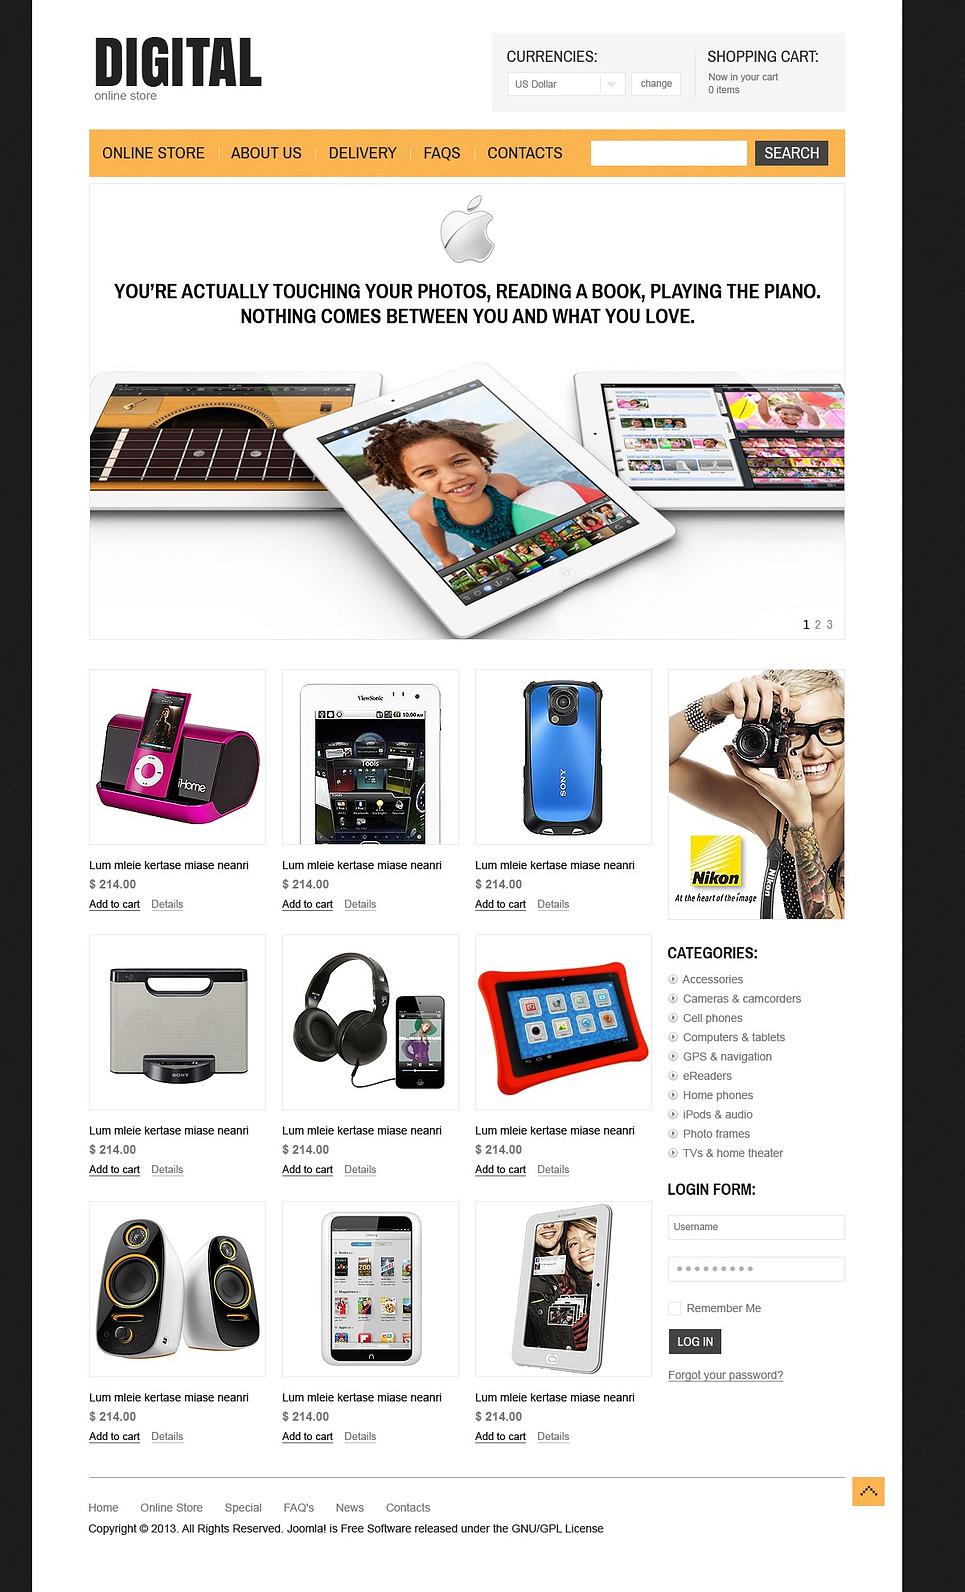 digital appliances virtuemart template web design templates website templates download. Black Bedroom Furniture Sets. Home Design Ideas